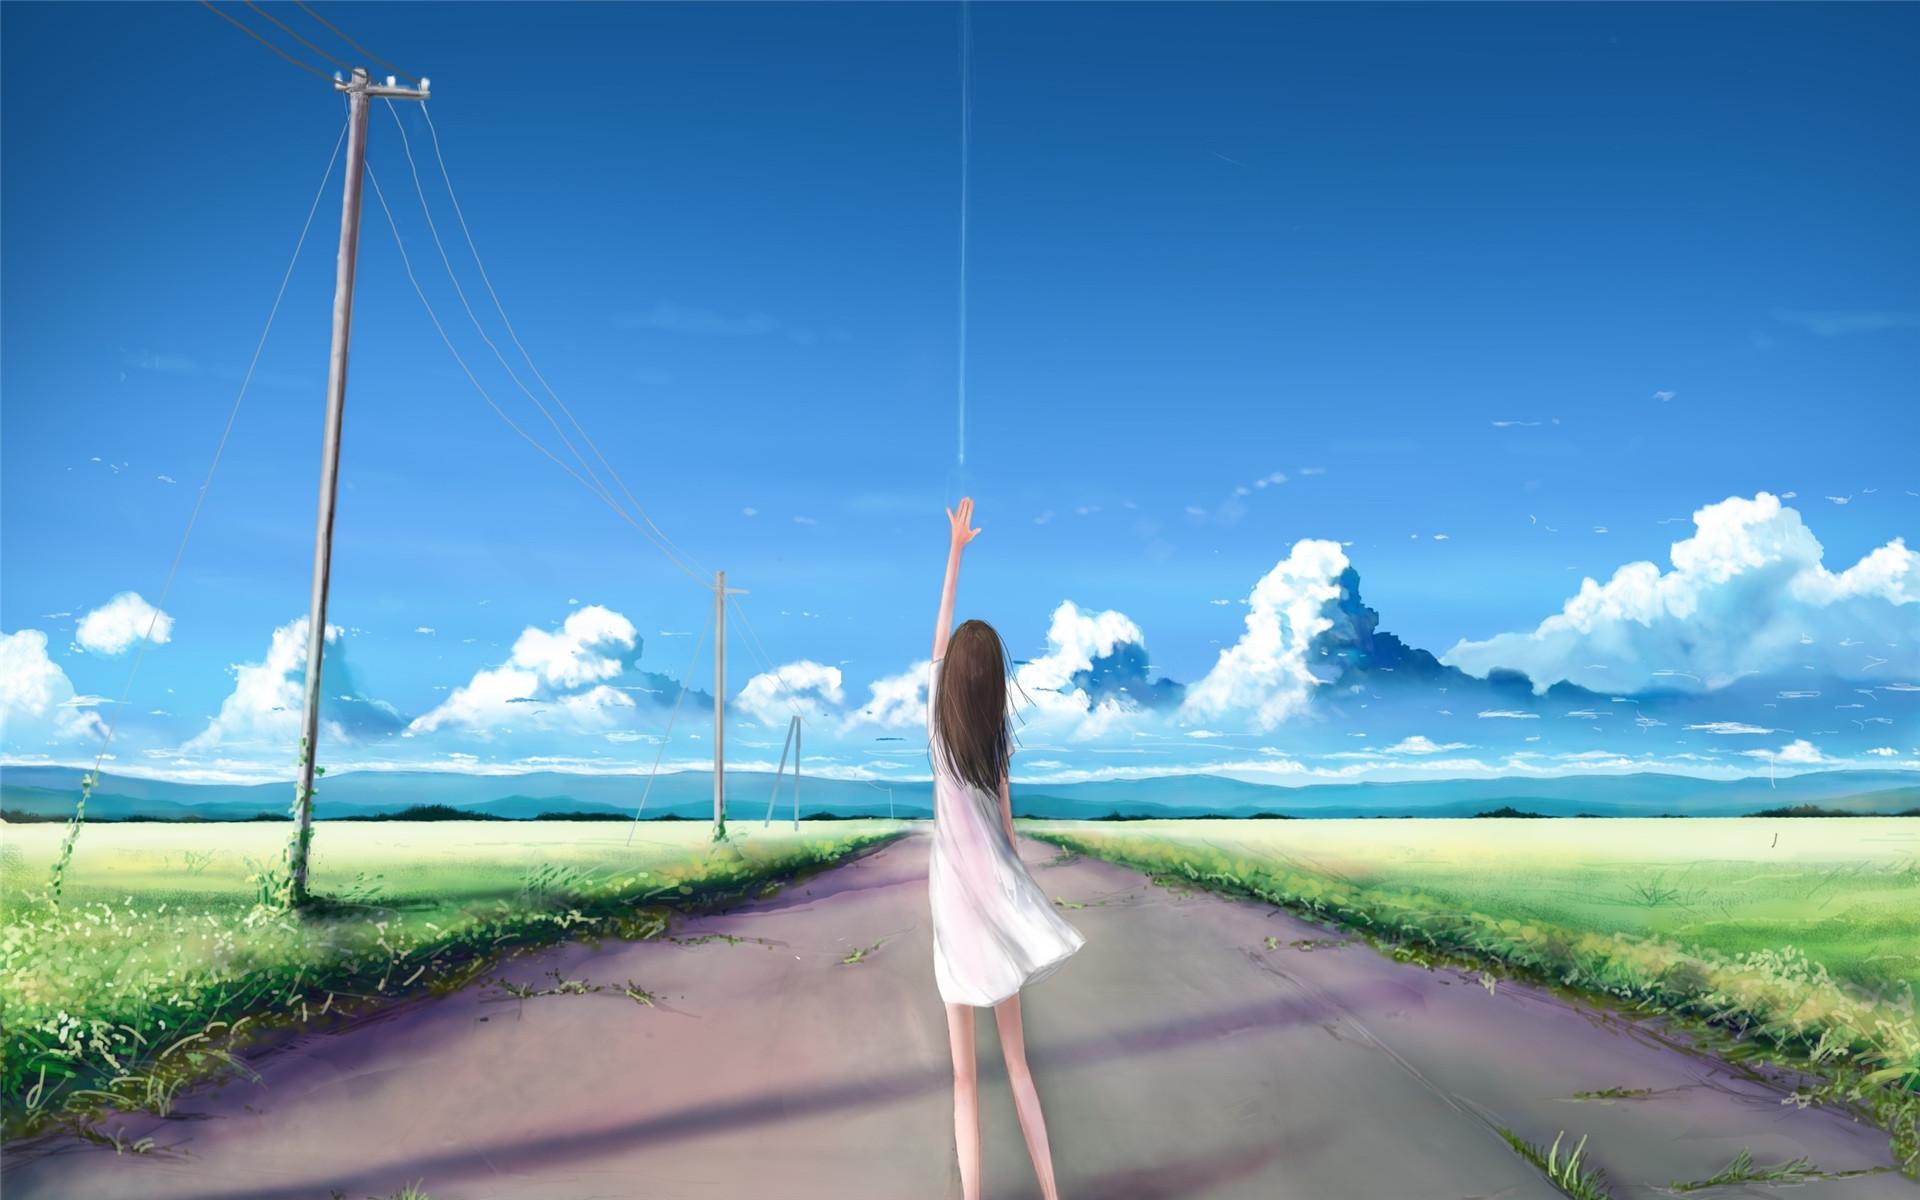 Anime Wallpaper Images 好看的动漫场景人物唯美电脑壁纸图片 卡通动漫 壁纸下载 美桌网